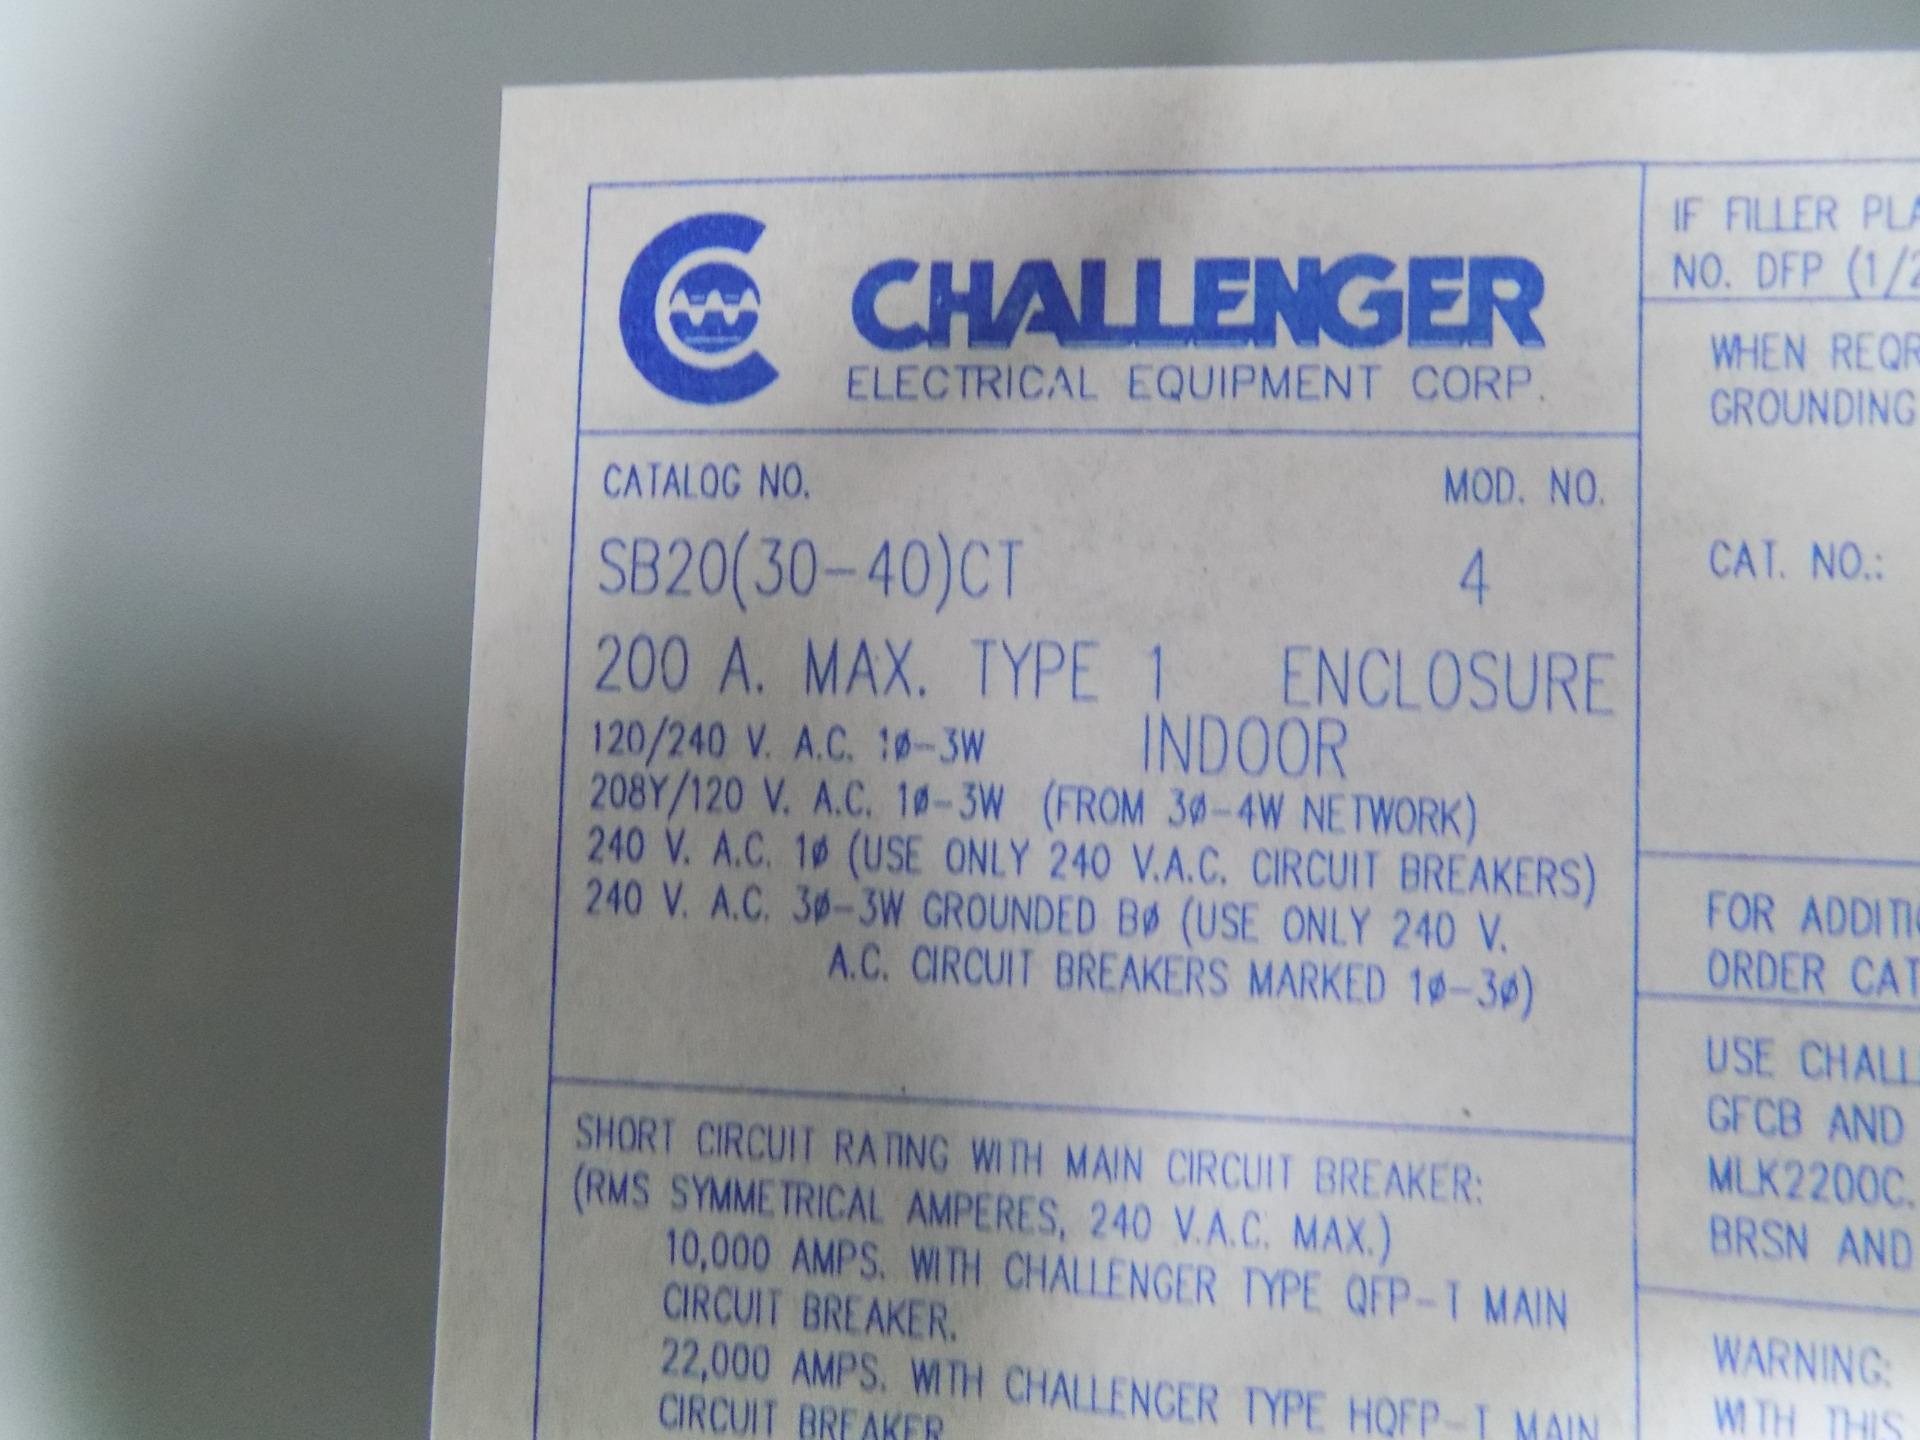 CHALLENGER BREAKER PANEL BOX 200AMP SB20 (30-40) CT NIB LS*JCH.03.08.2018*  SHELF*51-1954(1)* JOBCODE*FL2718*